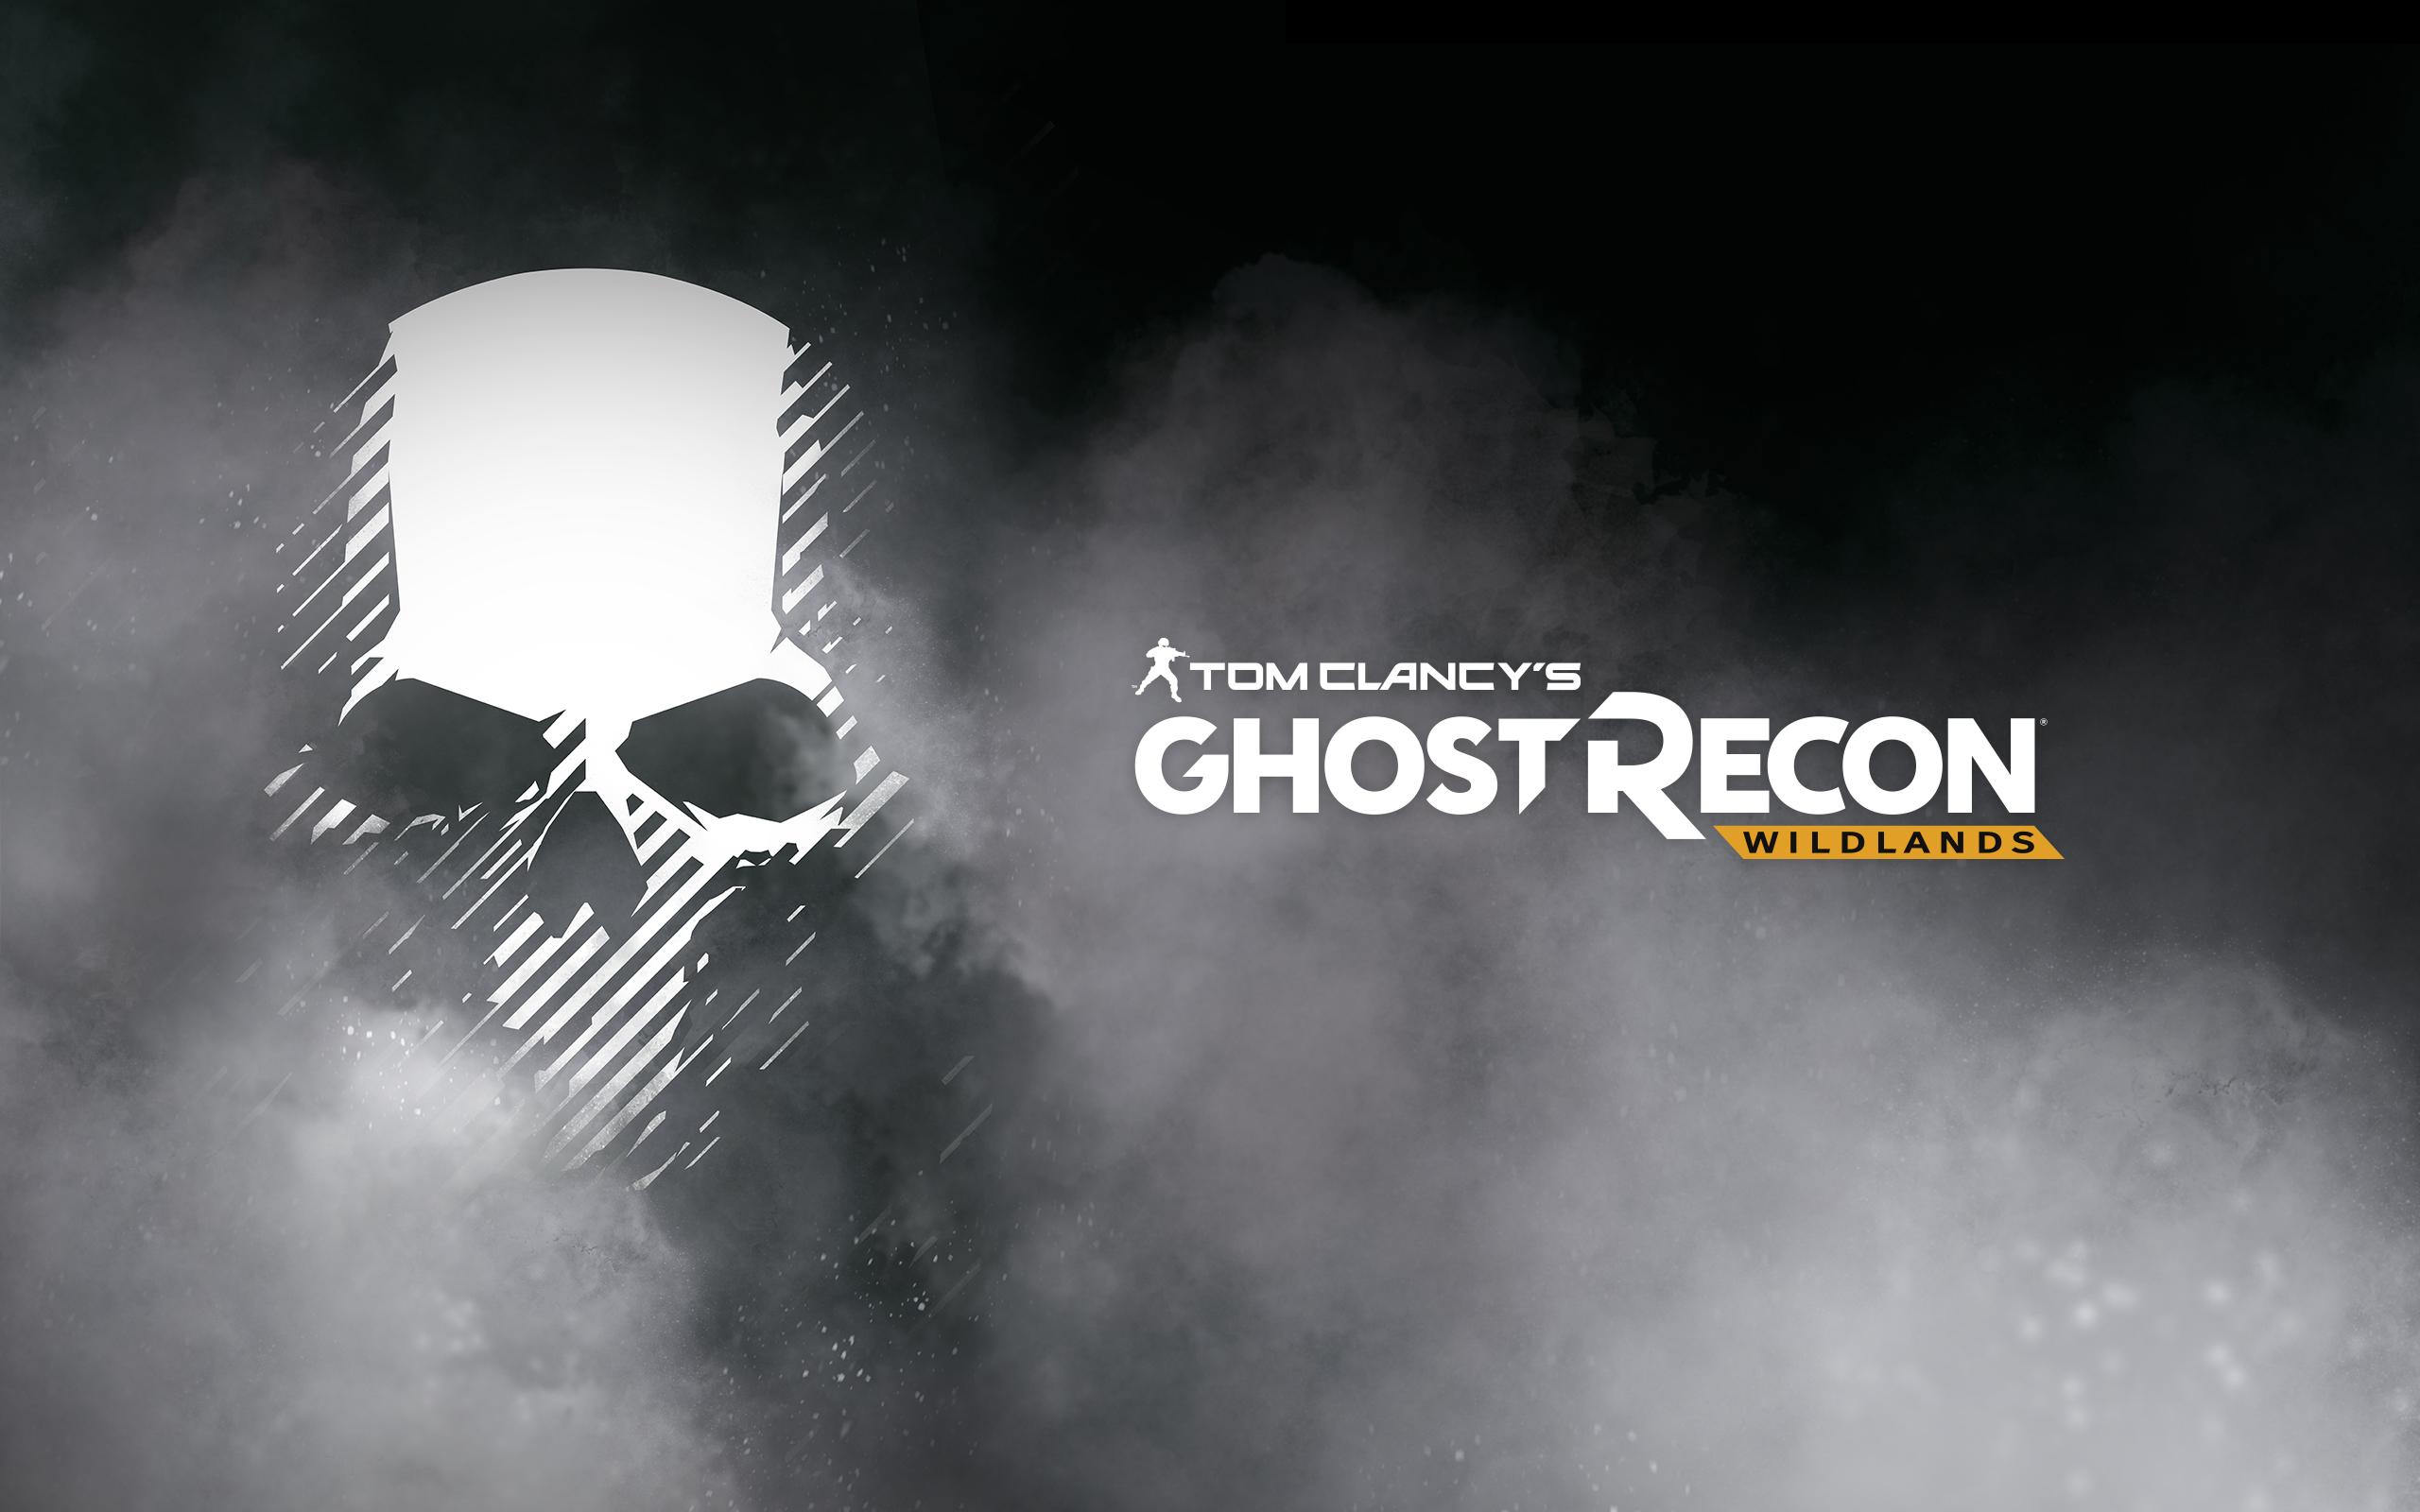 Tom Clancys Ghost Recon Wildlands Wallpapers HD ...  Skull Ghost Recon Wildlands